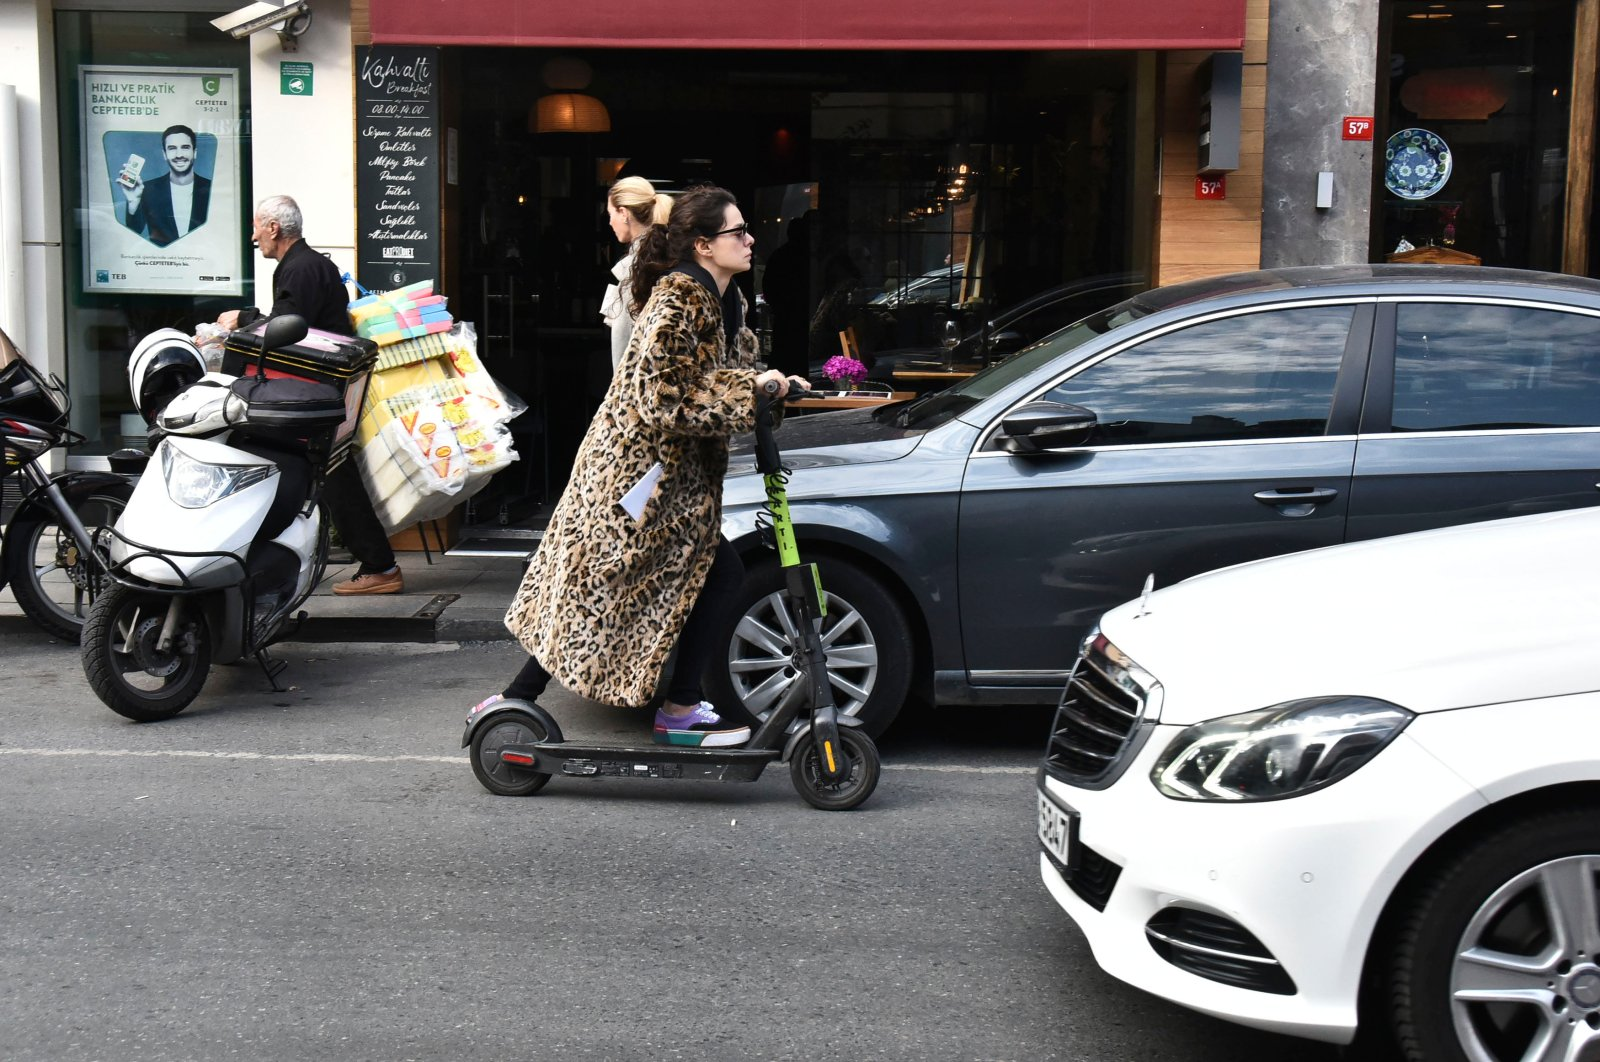 Actress Özge Özpirinççi rides an e-scooter in Bebek neighborhood, in Istanbul, Turkey, December 2, 2019. (PHOTO BY ALİ KESER)